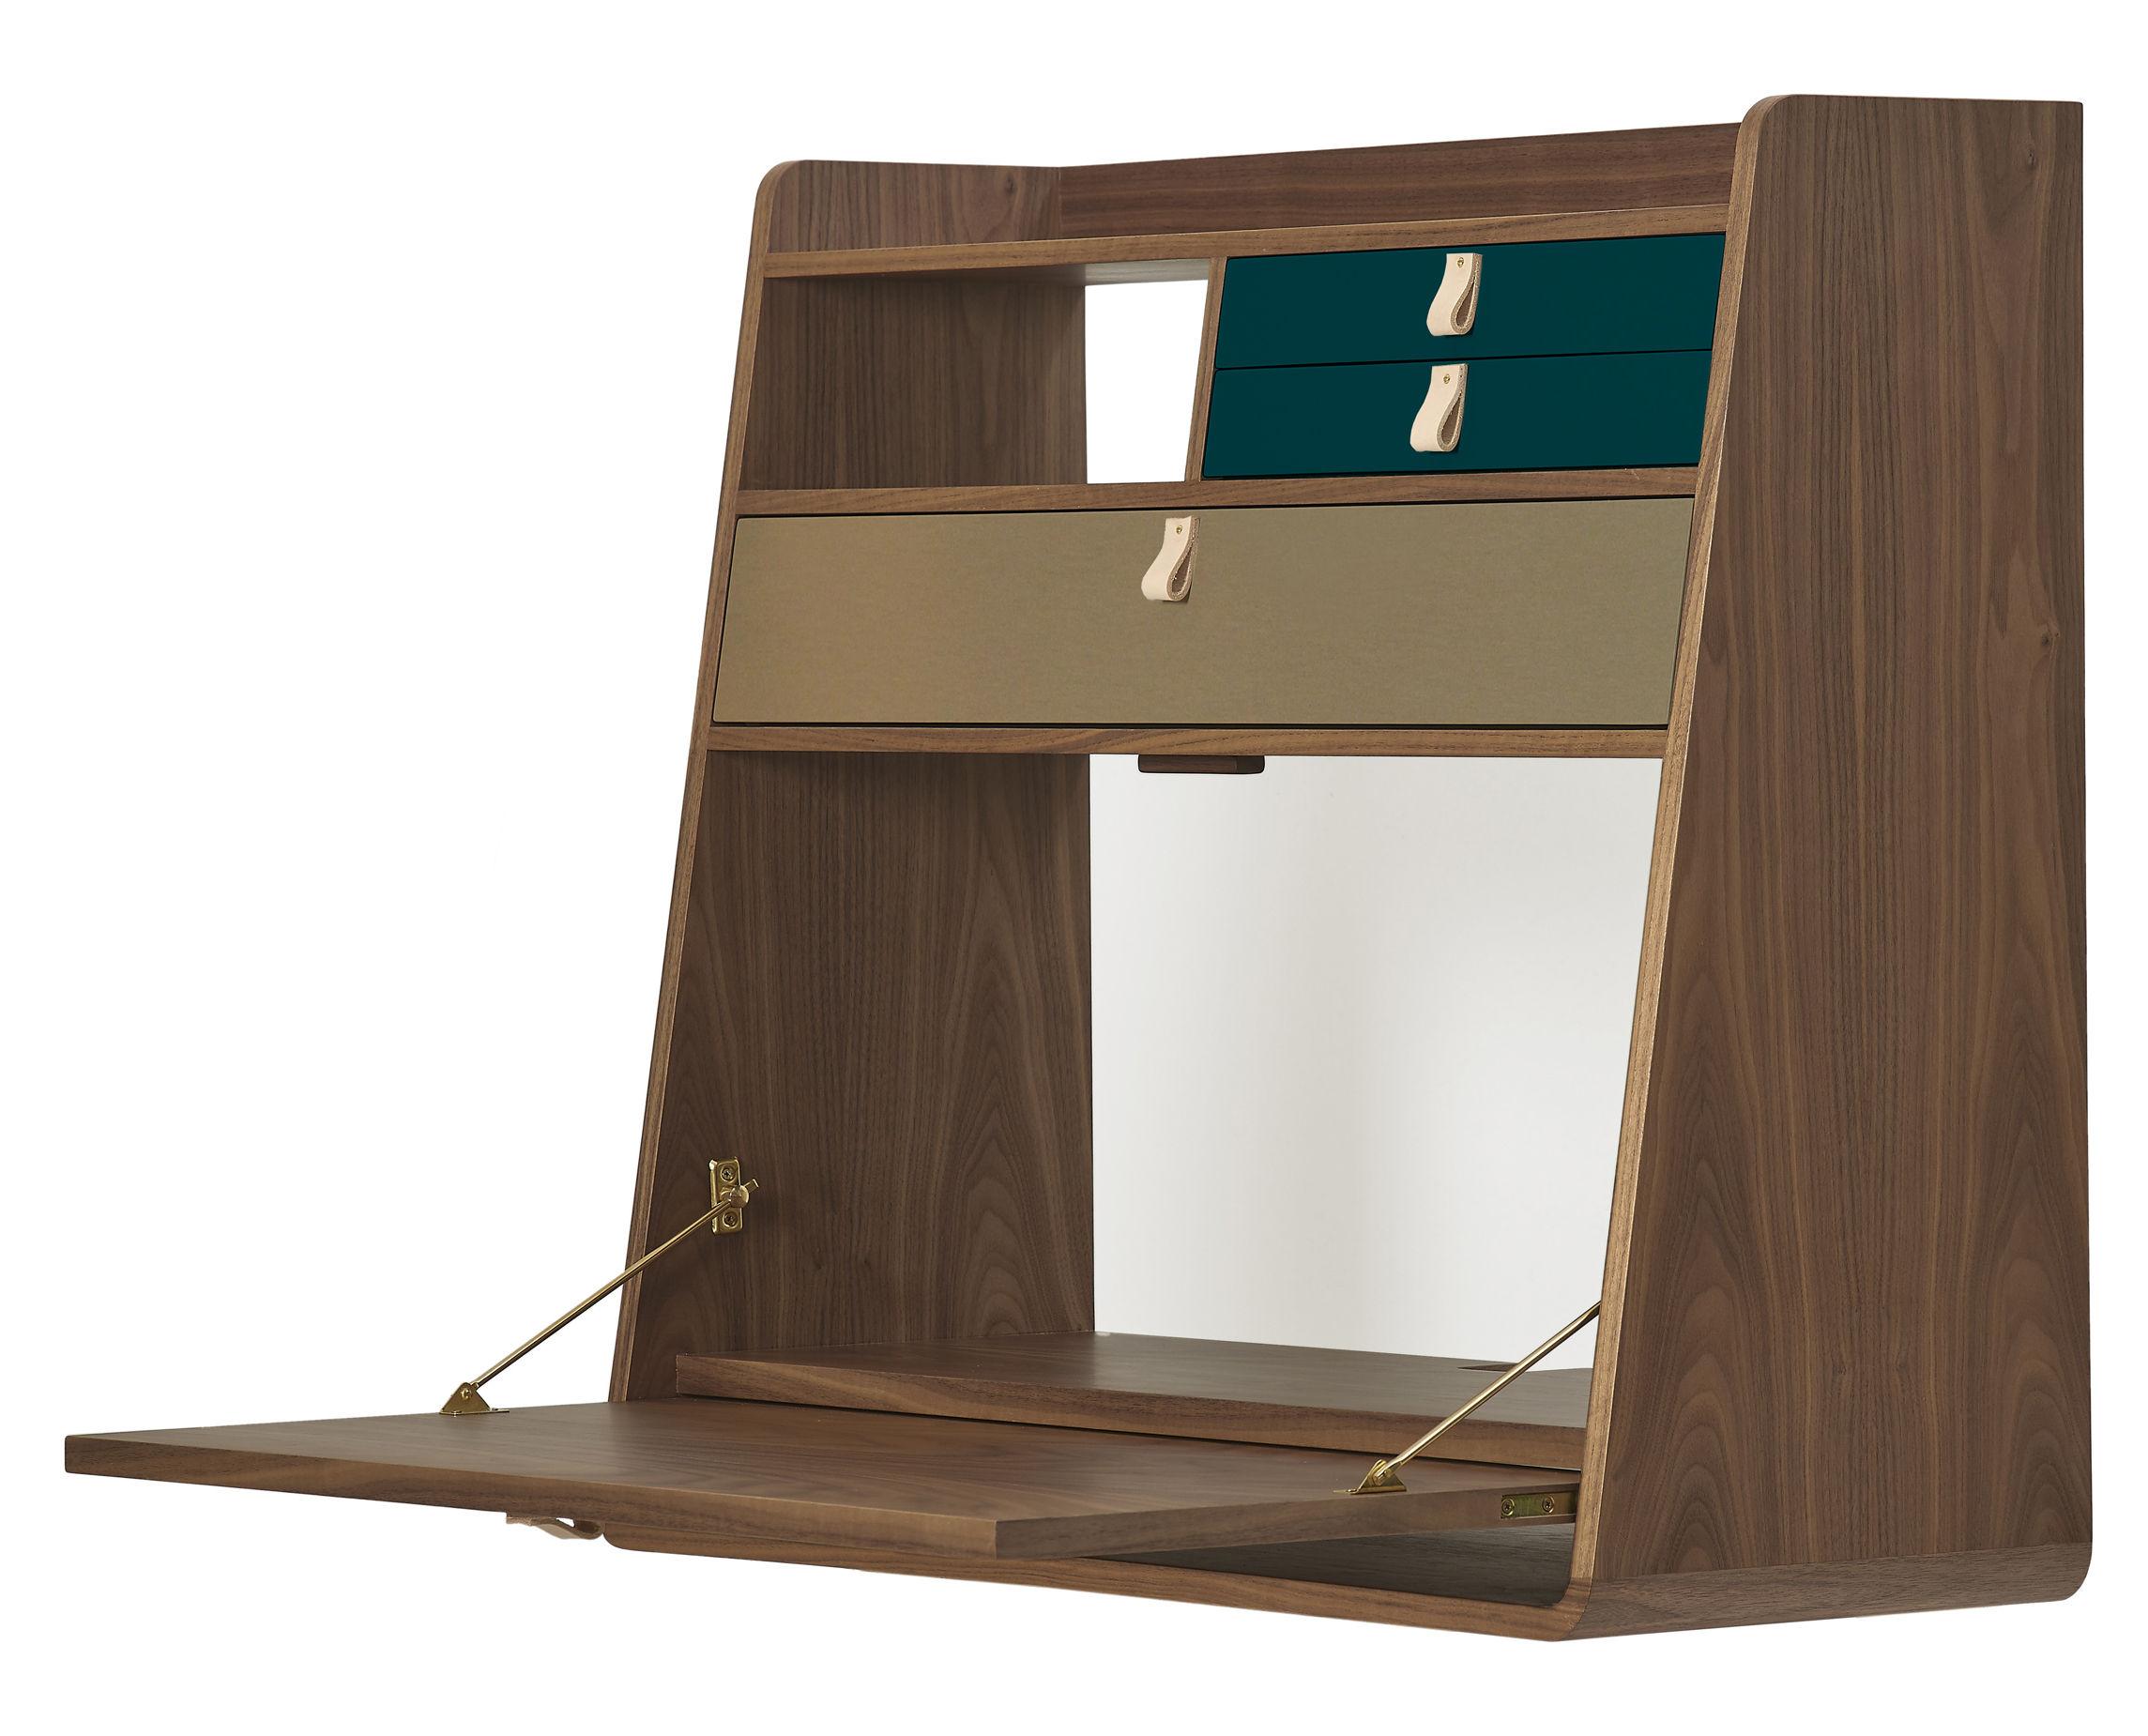 Furniture - Office Furniture - Gaston Wall writing desk - / L 80 x H 72 cm by Hartô - Brass & Petrol blue / Walnut - Walnut plated MDF